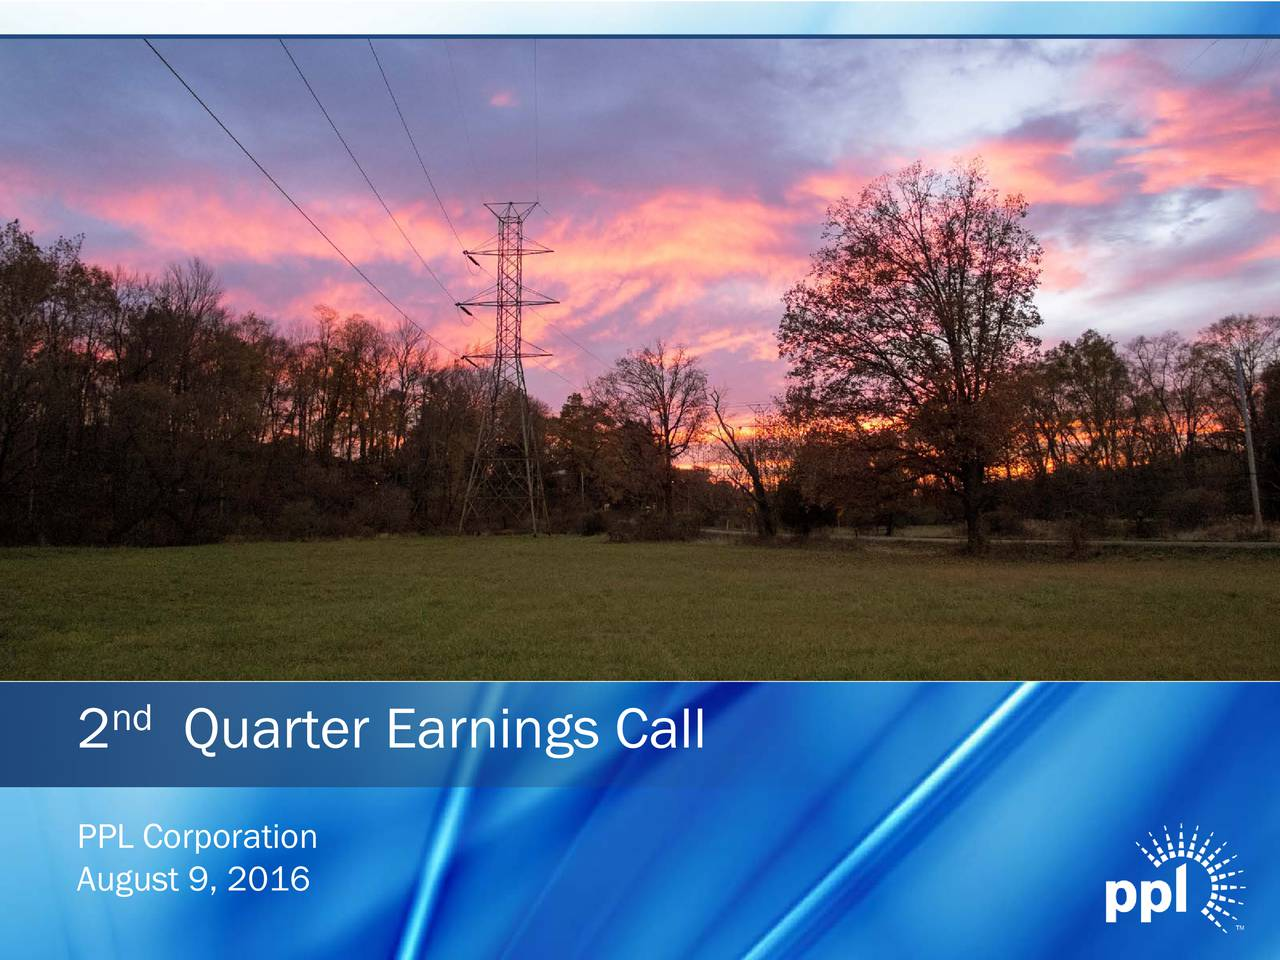 2 Quarter Earnings Call PPL Corporation August 9, 2016